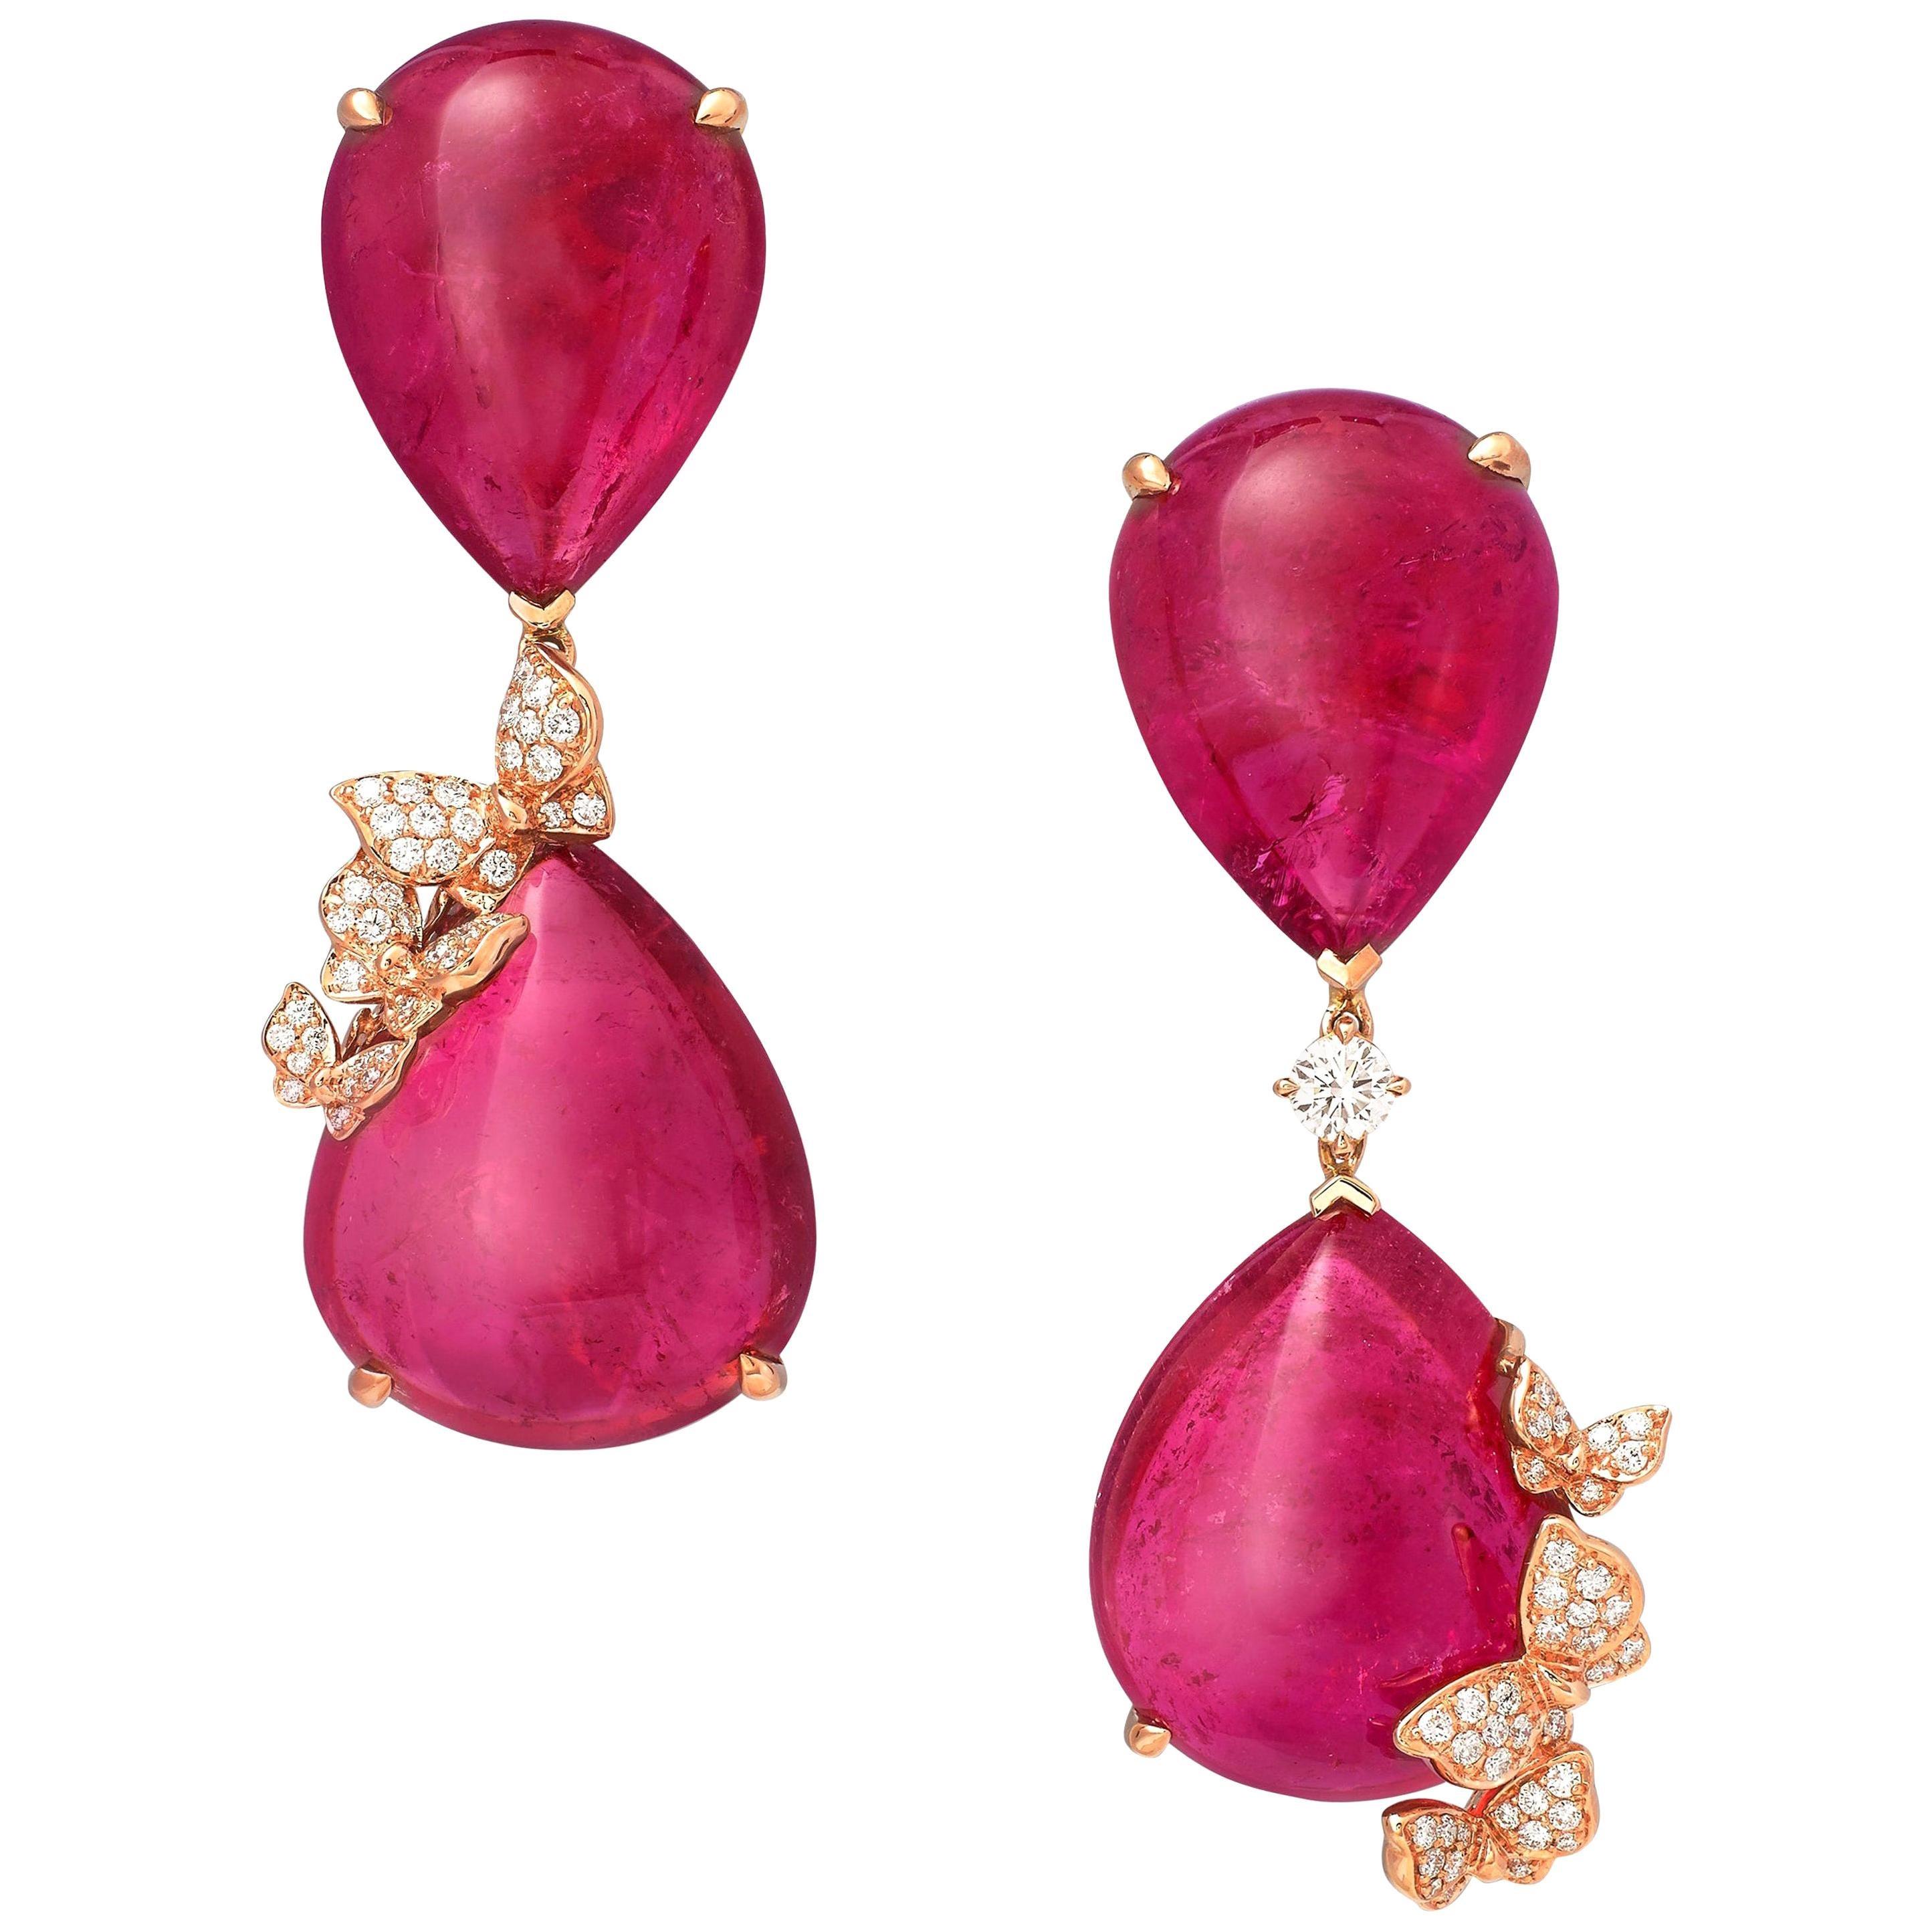 18 Karat Rose Gold, White Diamonds and Rubelites Cabochon Earrings